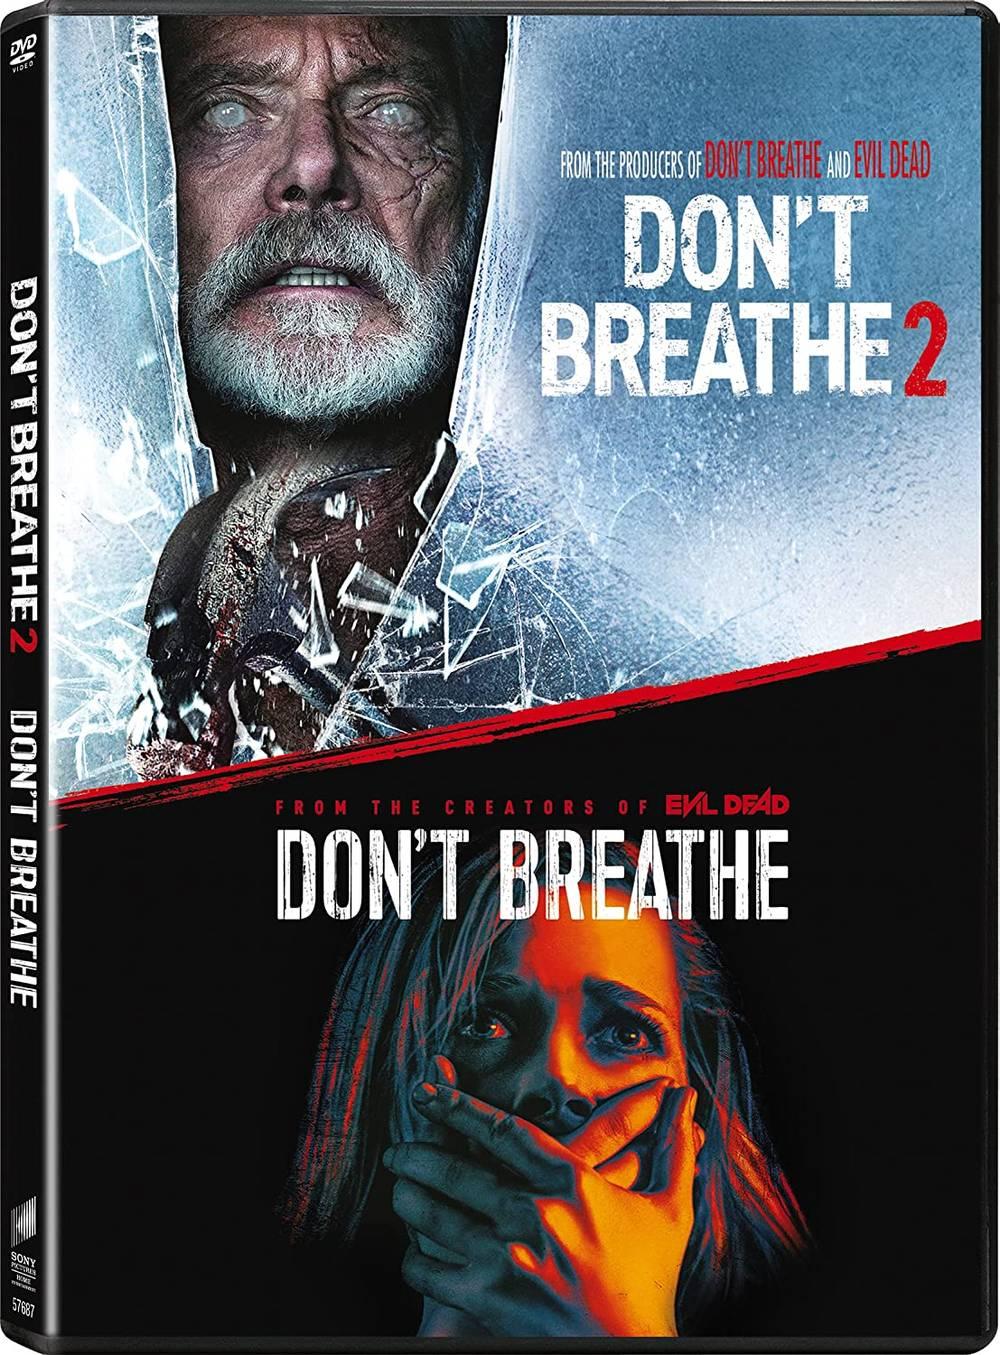 Don't Breathe [Movie] - Don't Breathe / Don't Breathe 2